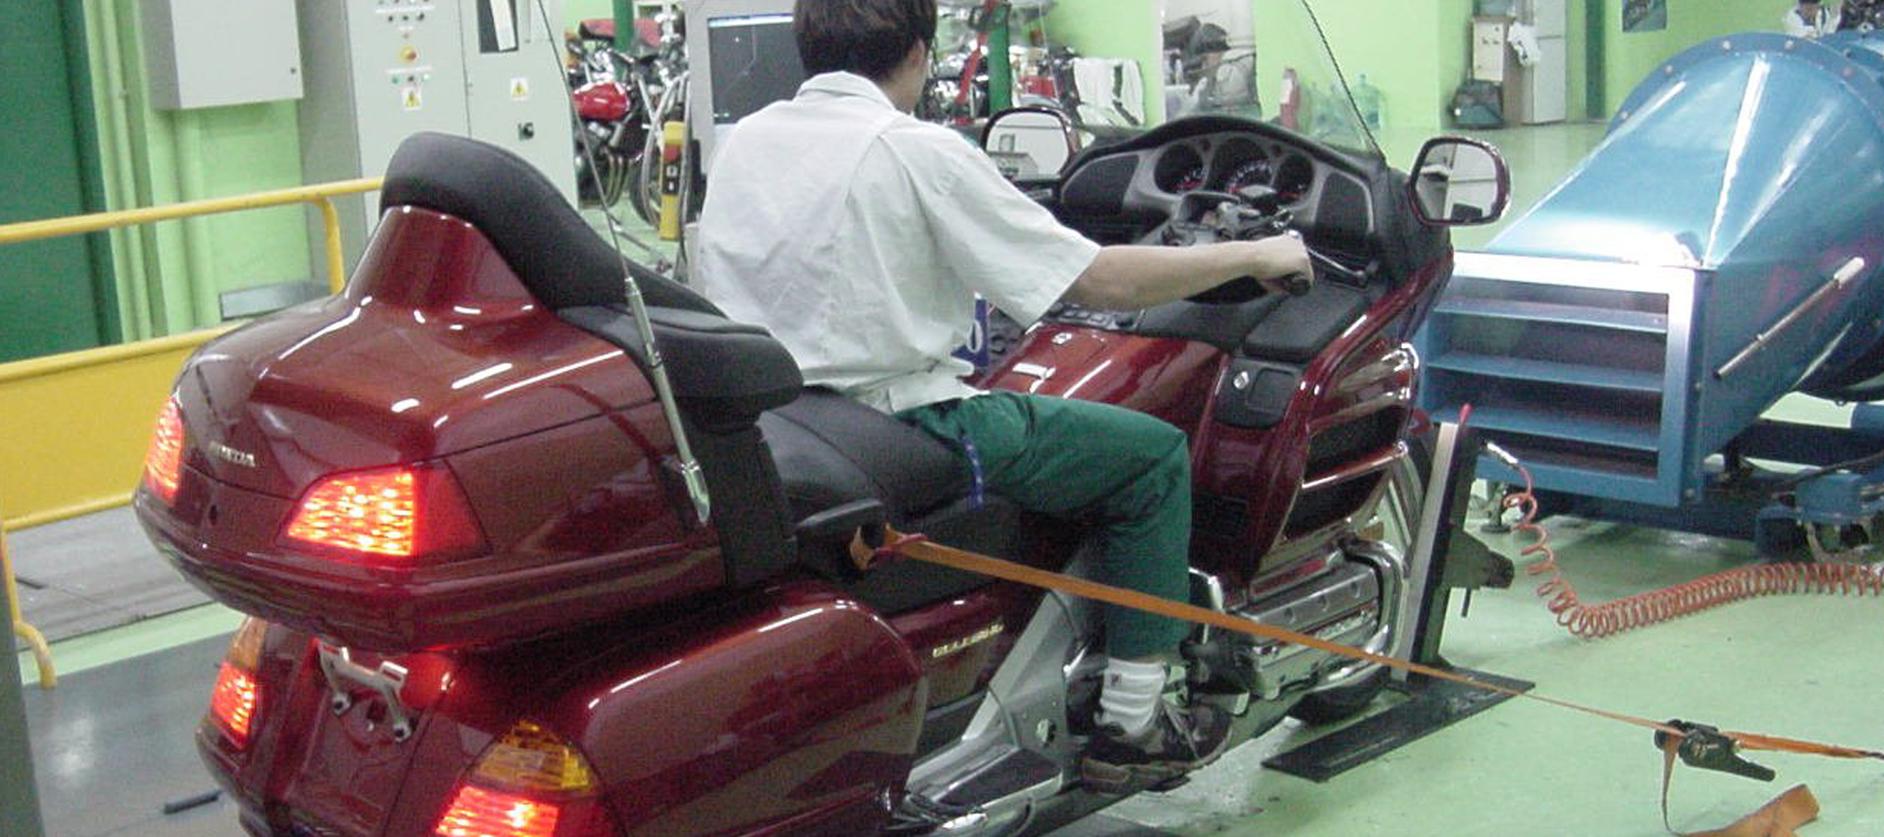 Motorcycle Cd